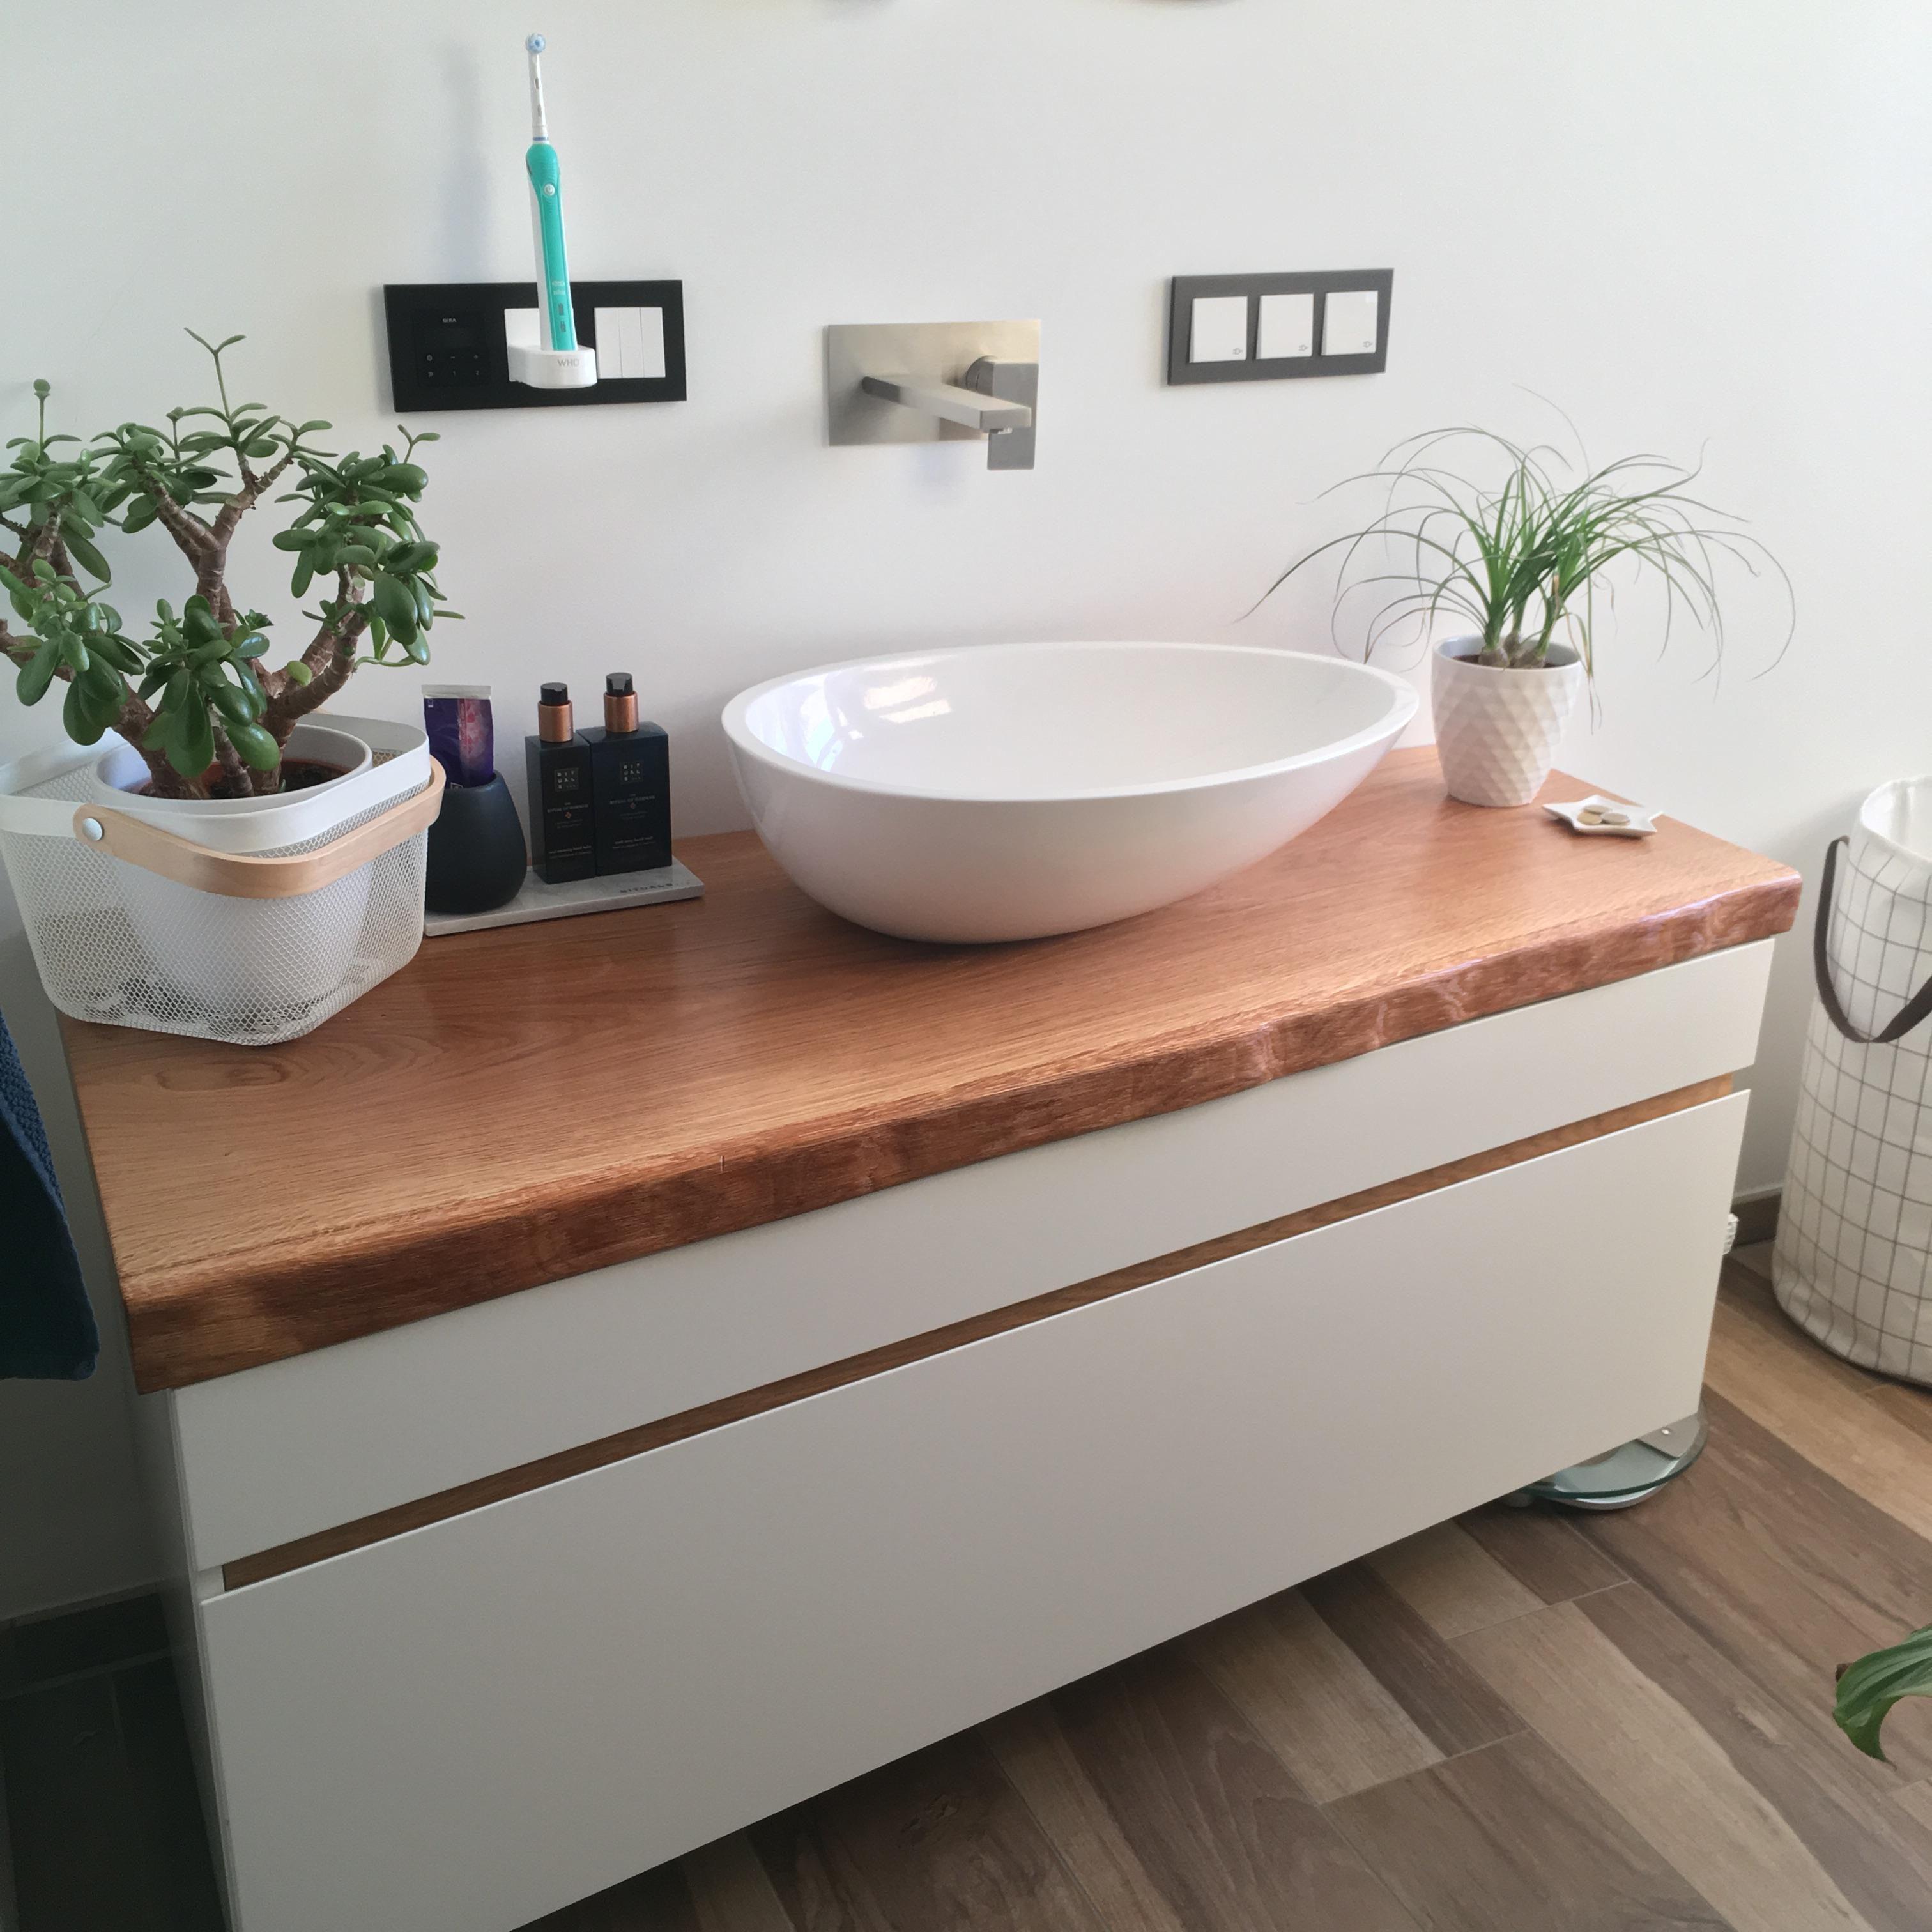 Badezimmer Bilder Ideen COUCHstyle - Www badezimmer de